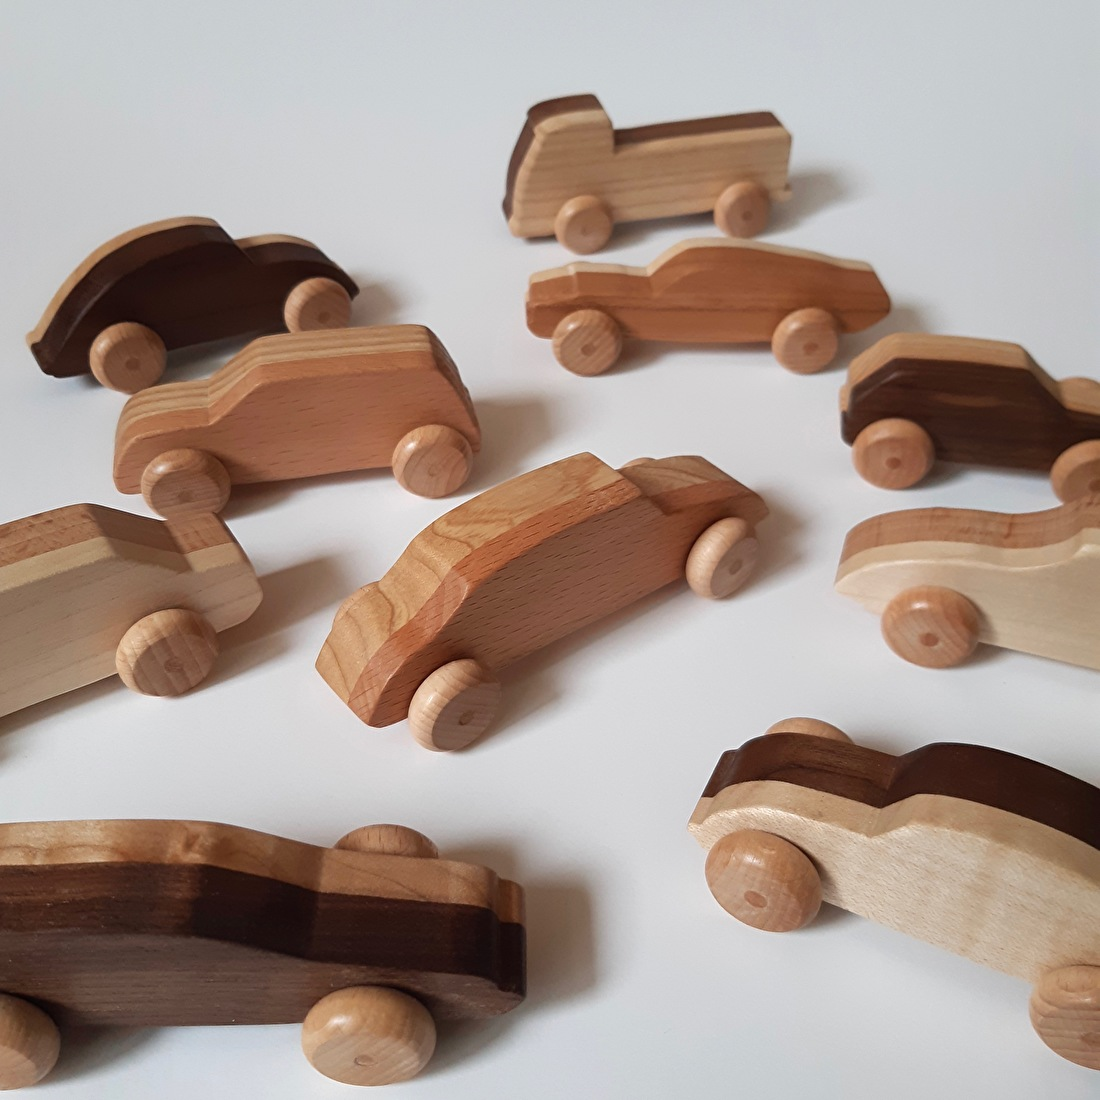 Houten speelgoedauto Houto